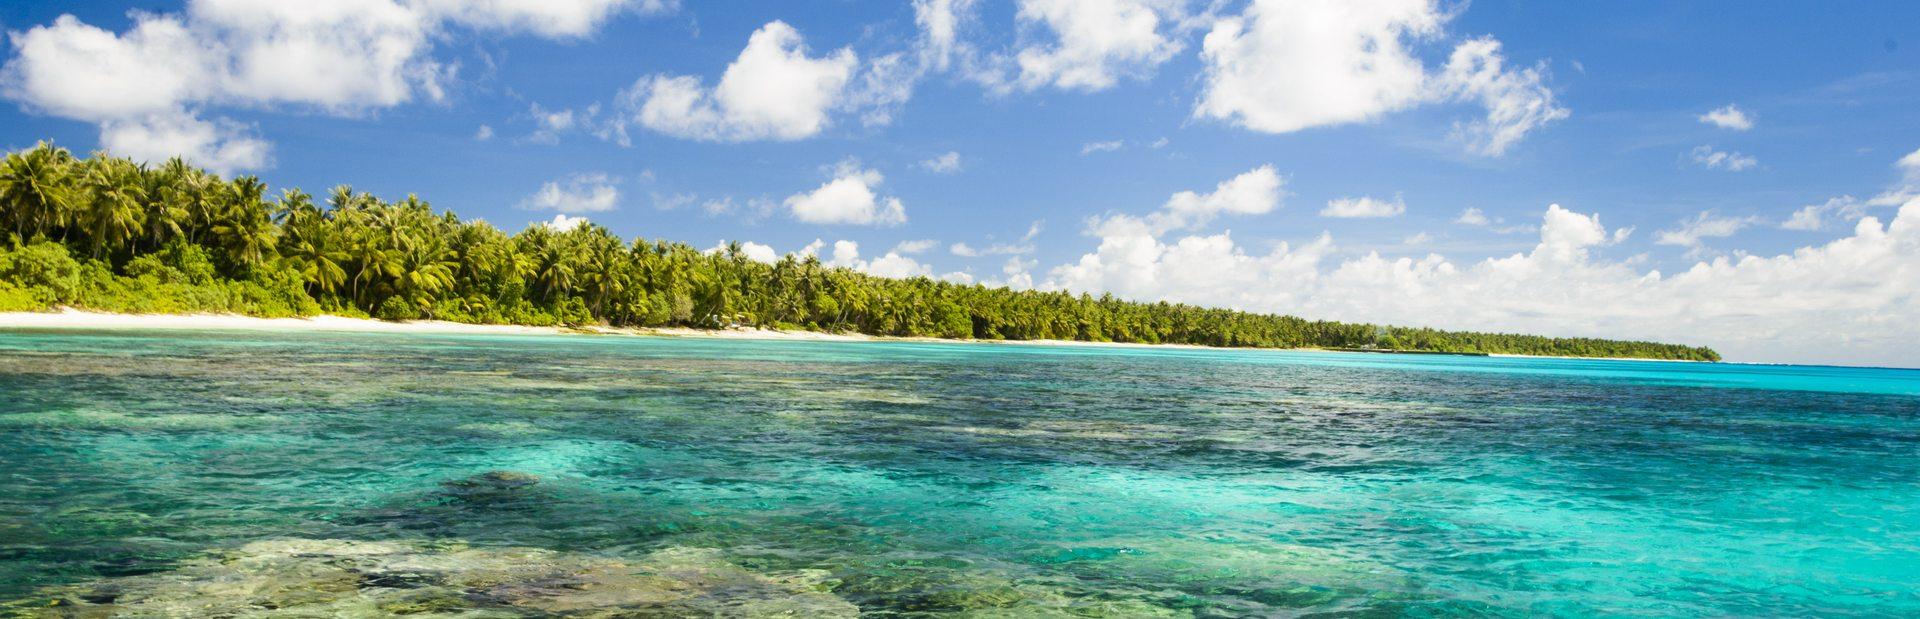 Marshall Islands guide